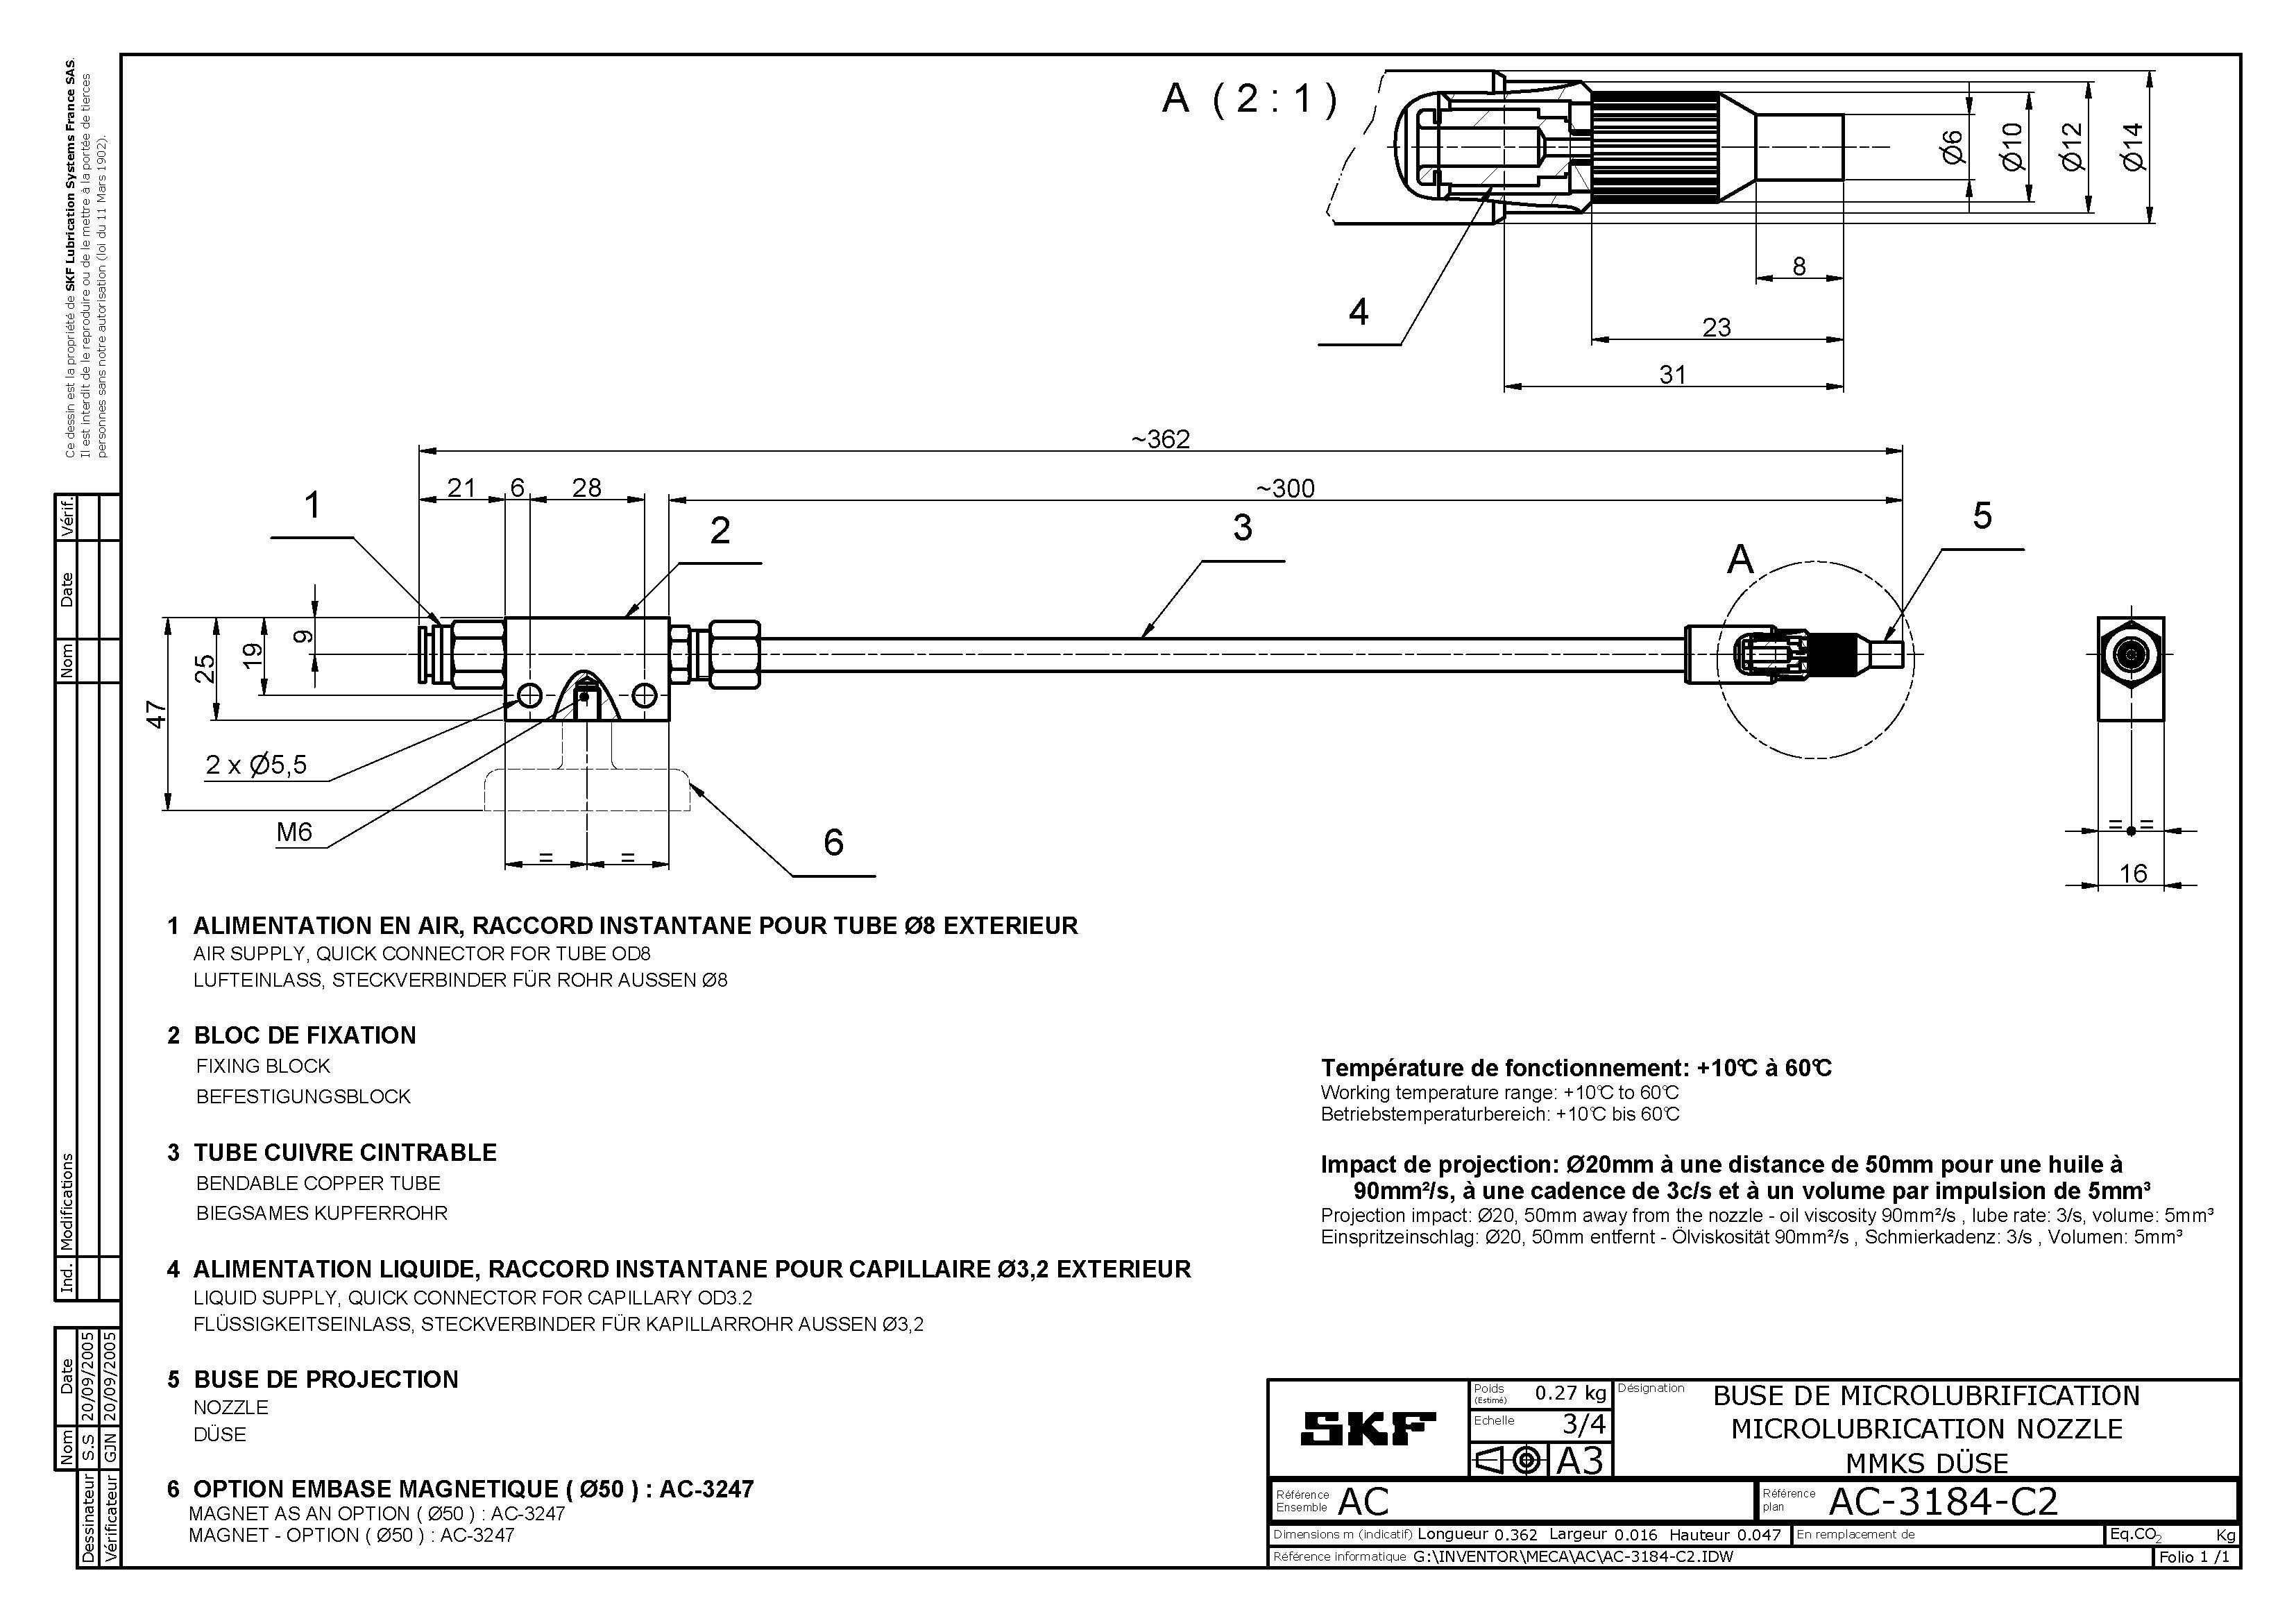 AC-3184-C2.jpg